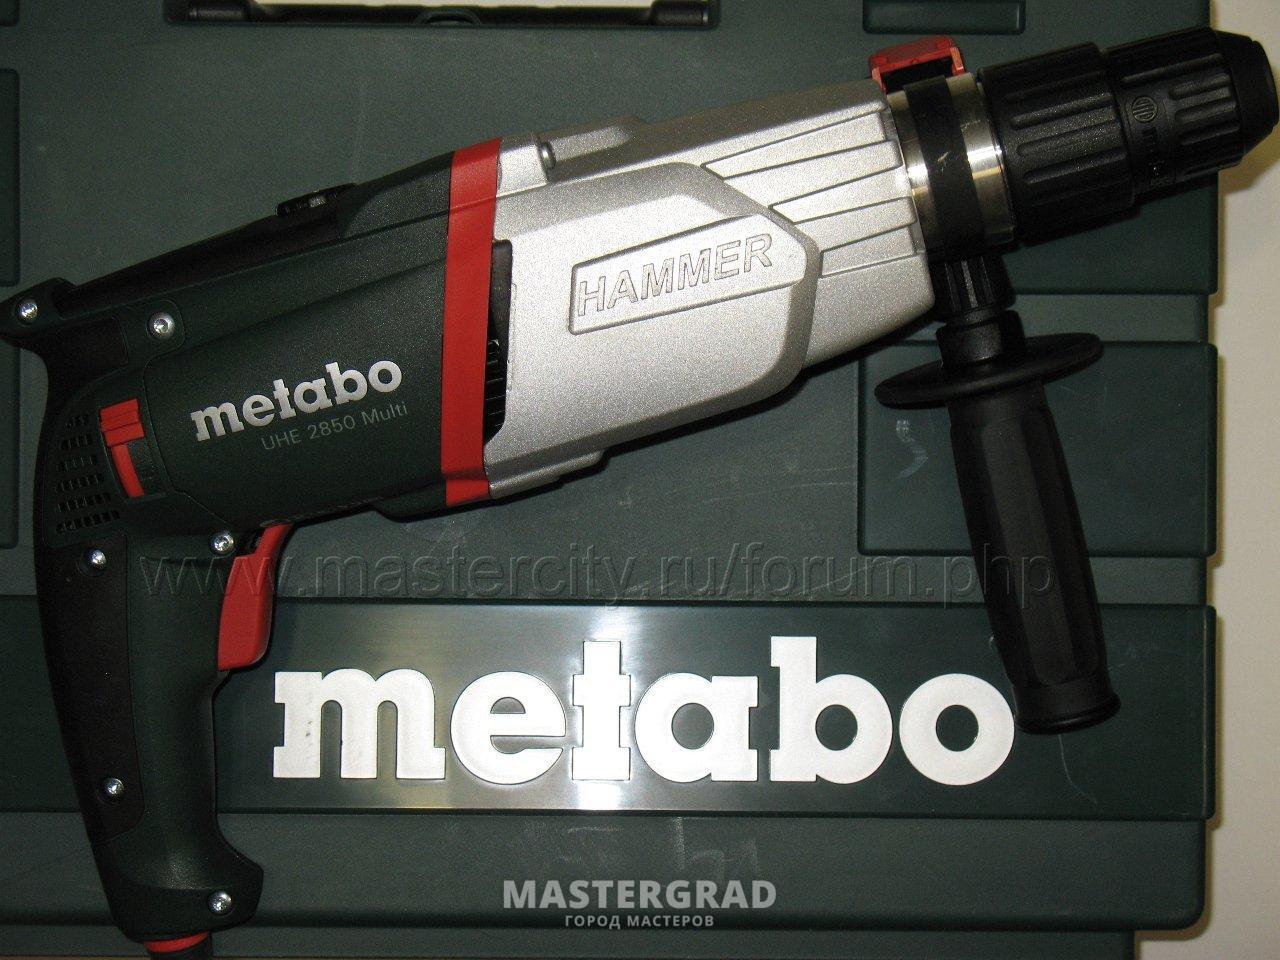 metabo uhe 2850 multi 2012 mastergrad. Black Bedroom Furniture Sets. Home Design Ideas